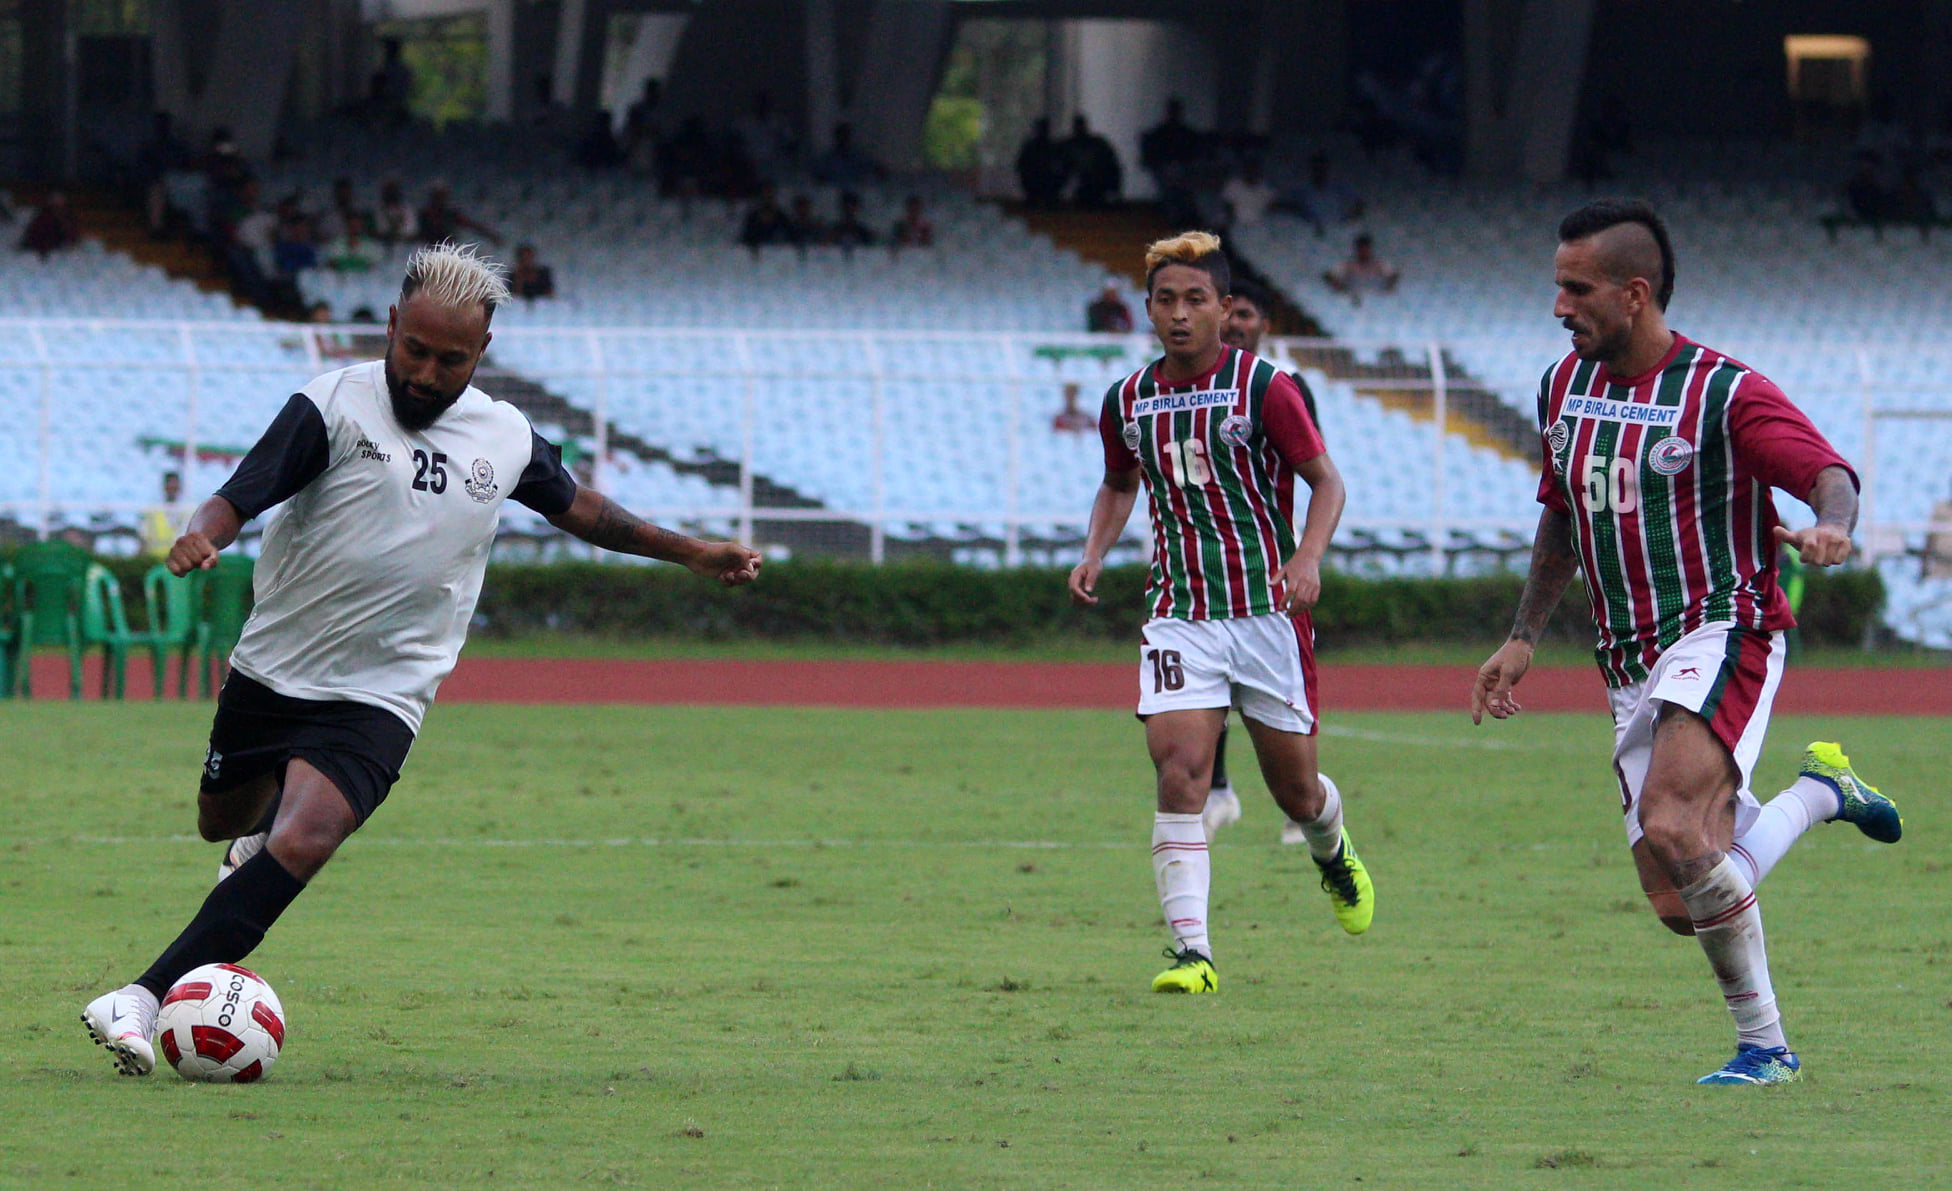 CFL 2019: Calcutta Premier Division A Roundup: Week 8